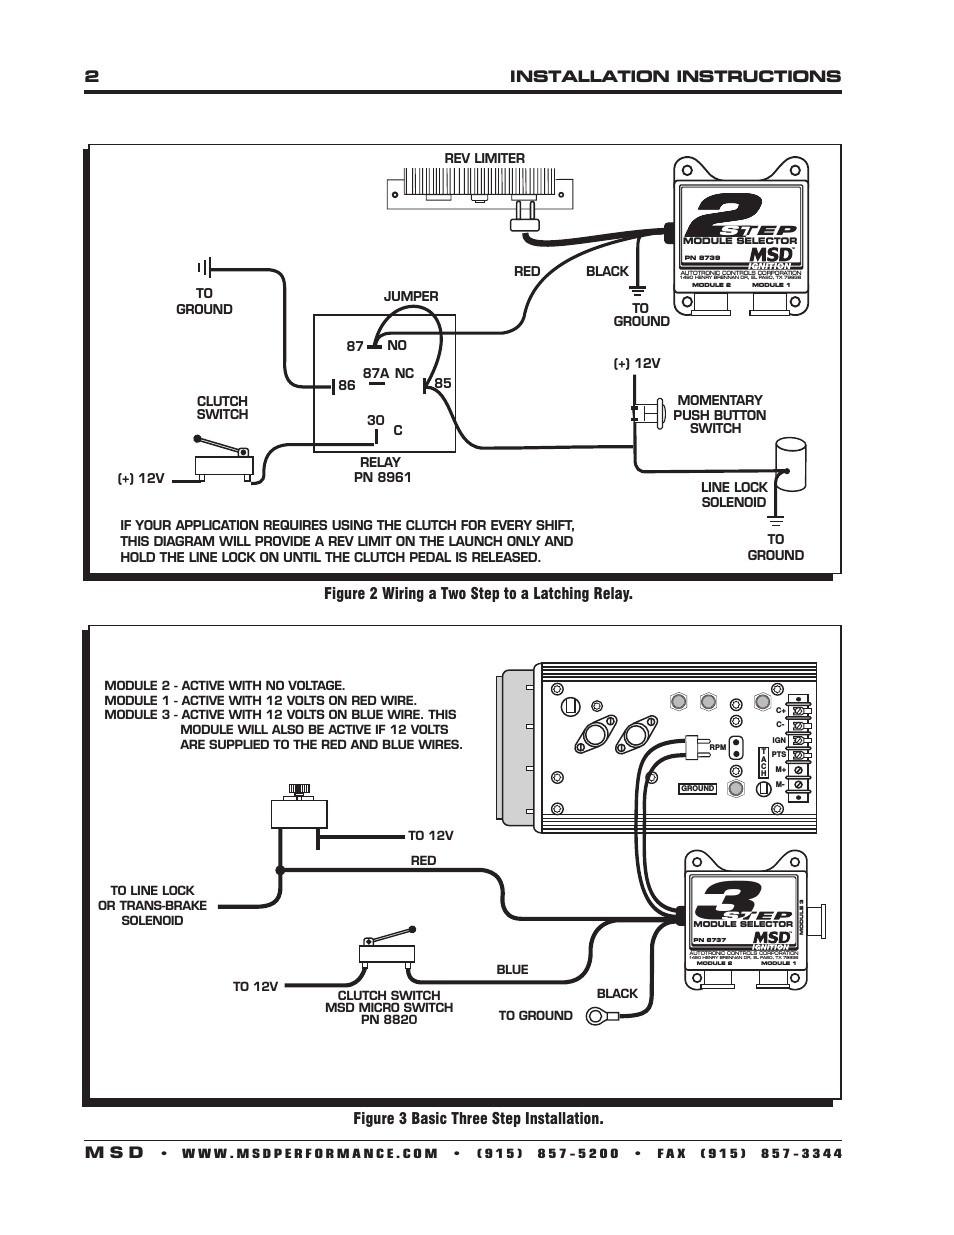 Msd Saturn Wiring Diagram Bosch Picturesque Zig Unit New Best Installation Instructions Figure Of 954x1235